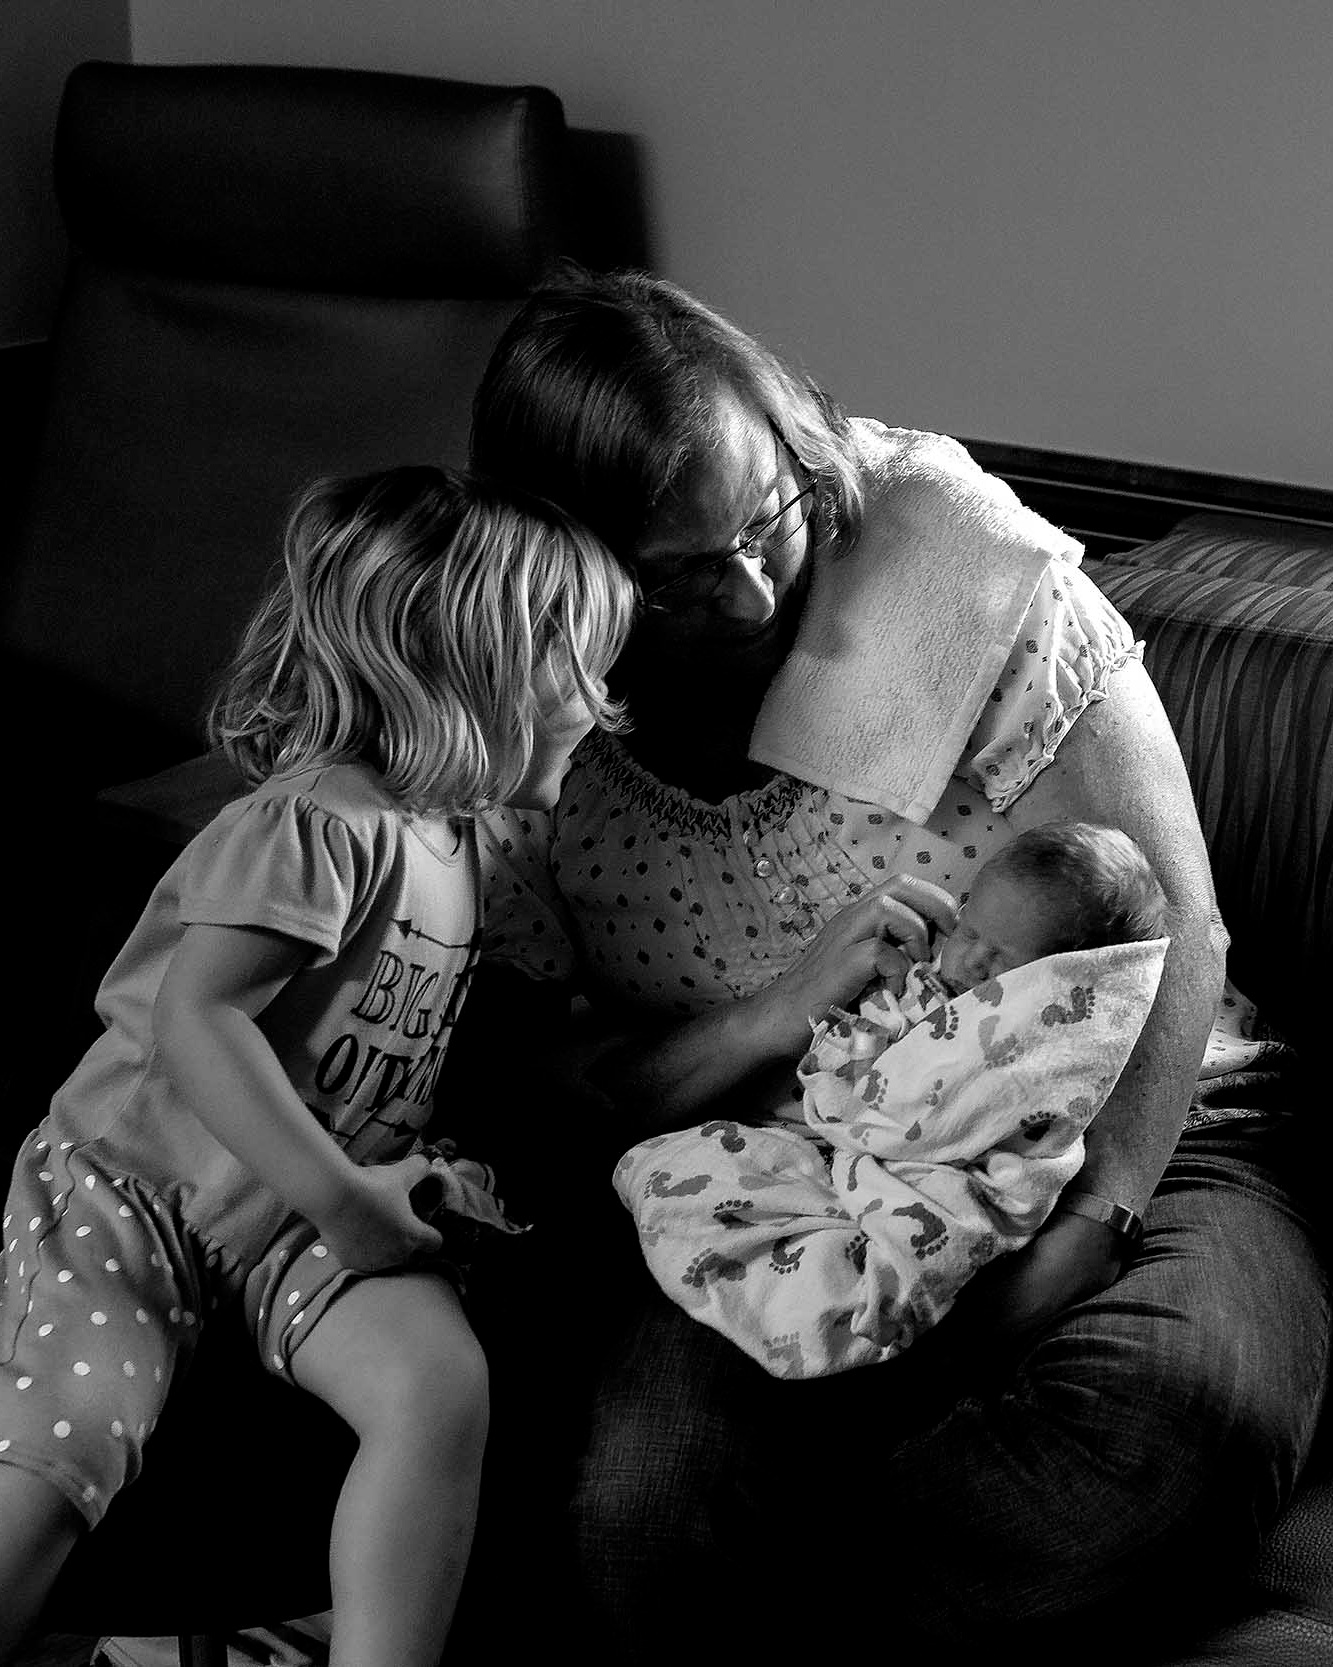 DFW Birth Photography — Birth & Life Photography